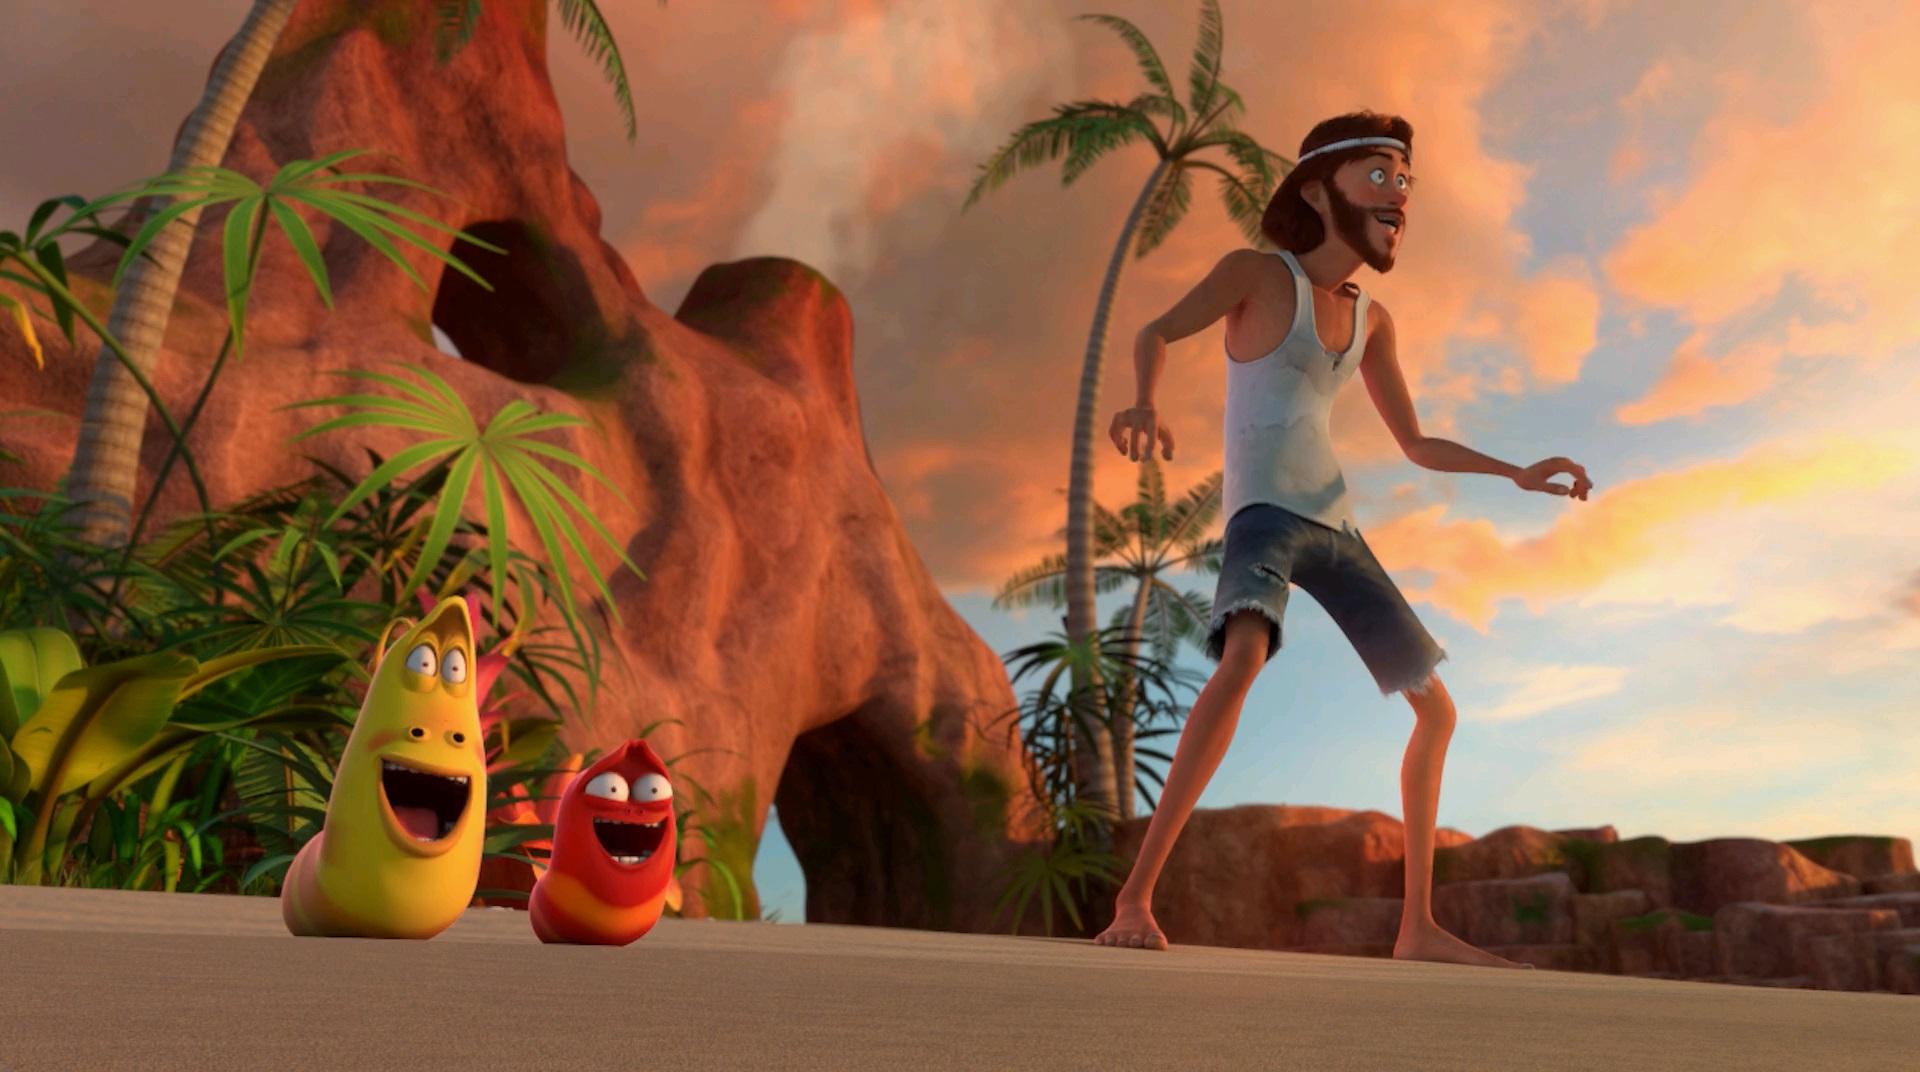 Larva Adası Filmi | The Larva Island Movie | 2020 | WEB-DL | XviD | Türkçe Dublaj | m720p - m1080p | WEB-DL | Dual | TR-EN | Tek Link